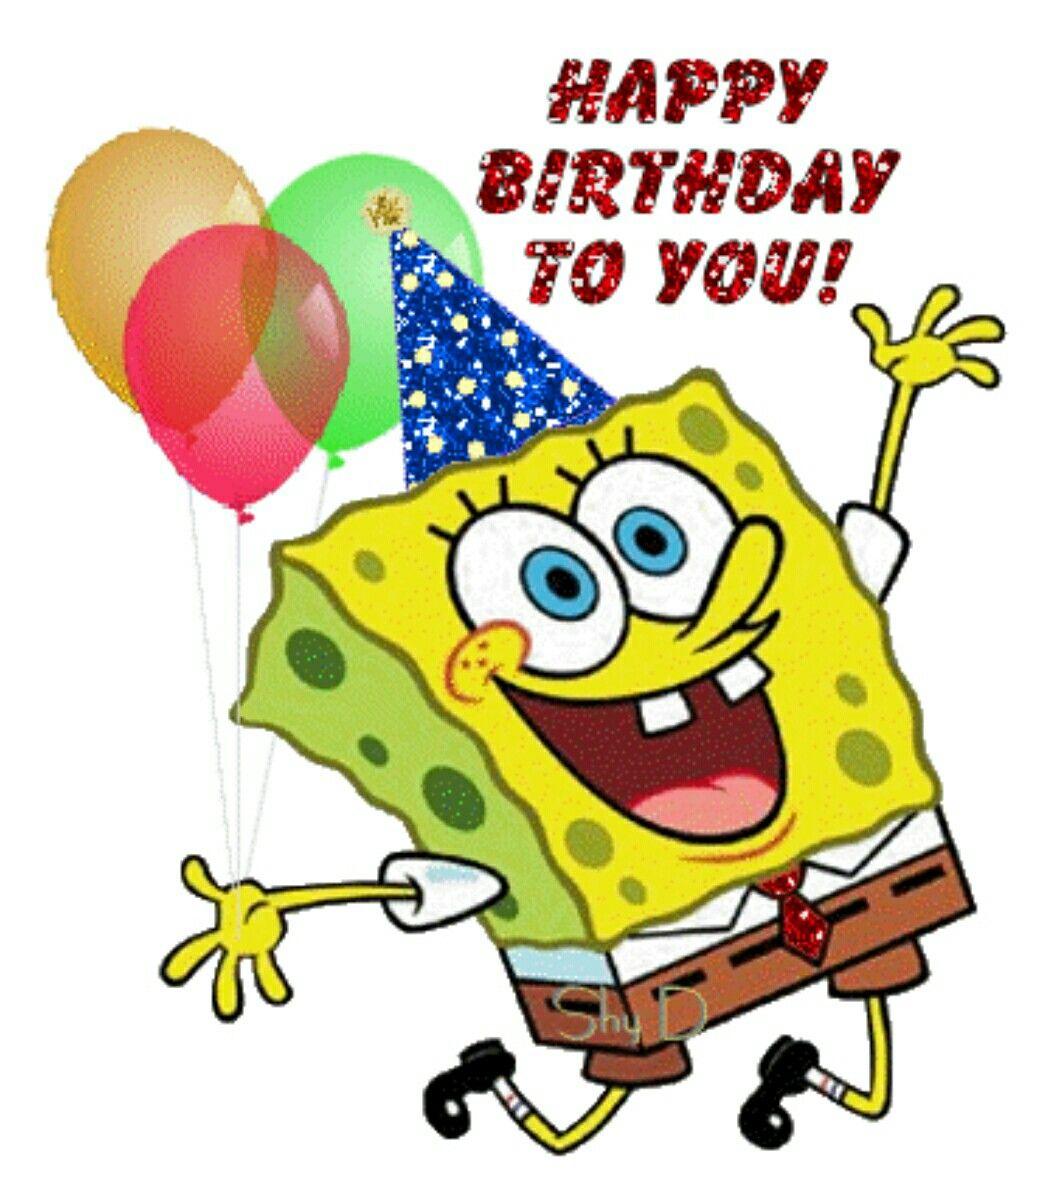 Birthday wishes happy birthday greetings birthday greeting cards birthday quotes birthday parties